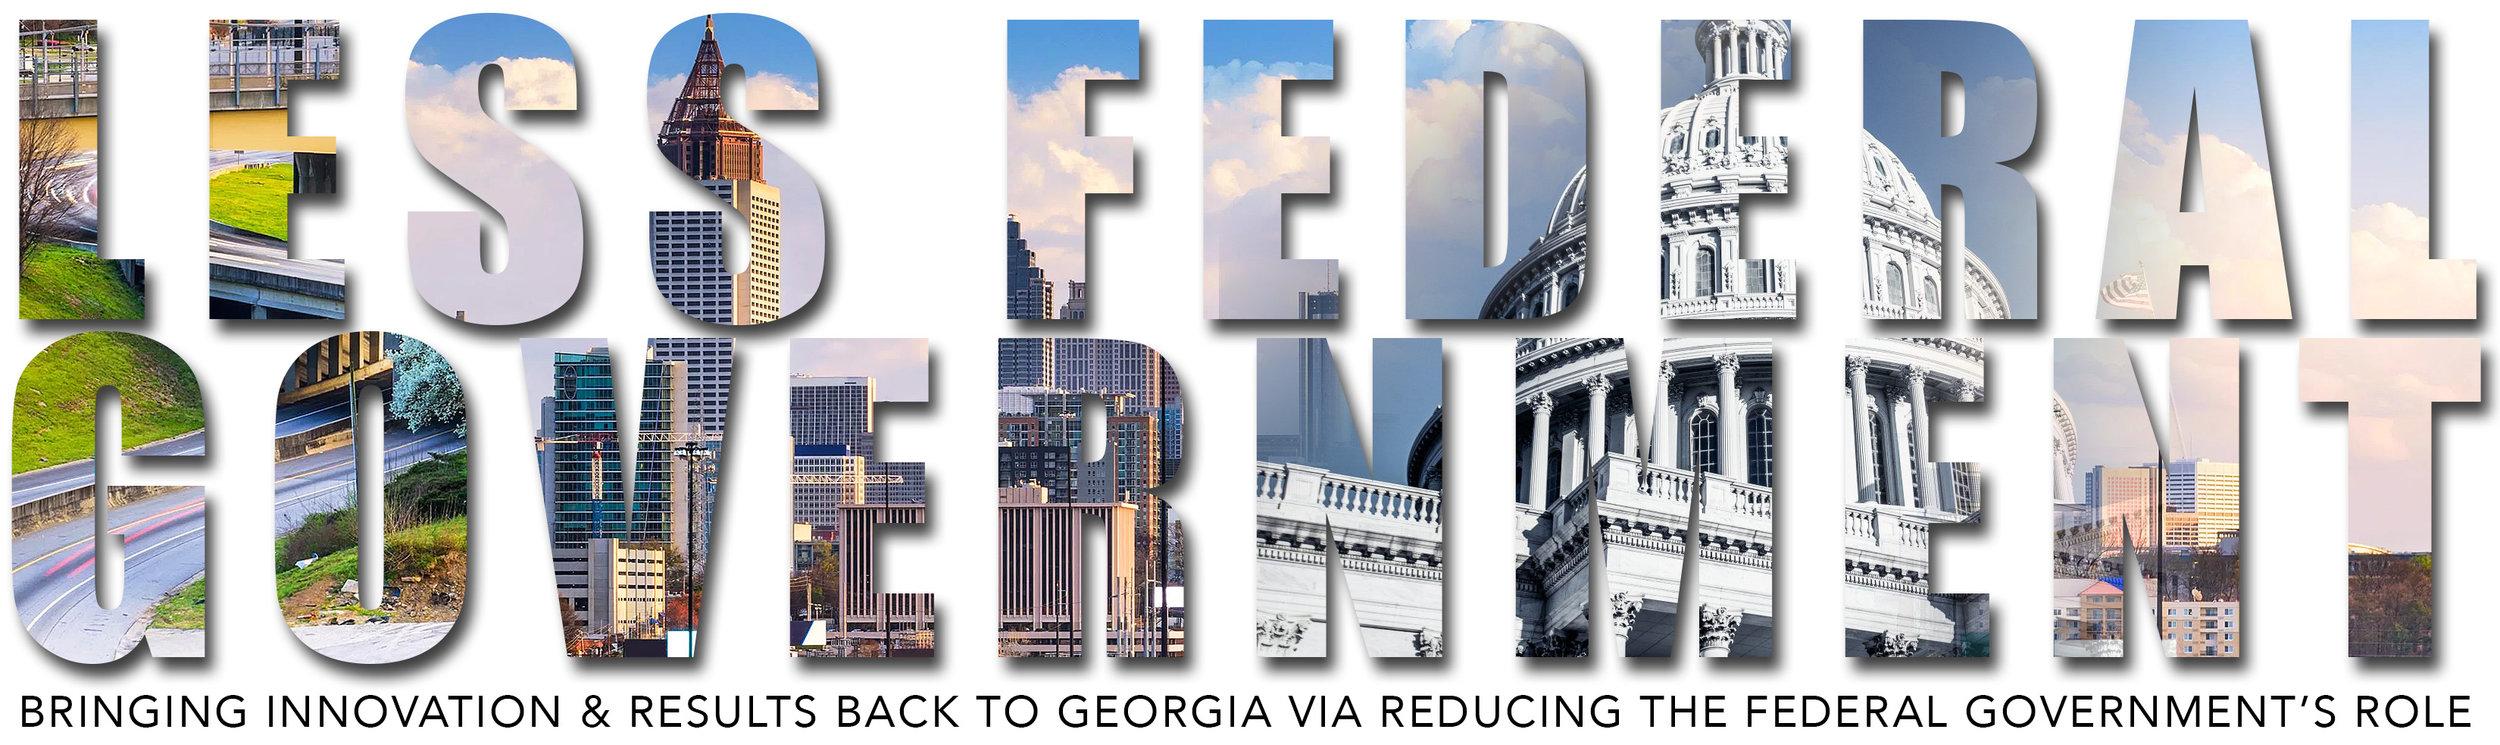 Less Federal Title - Joshua Seedman.jpg